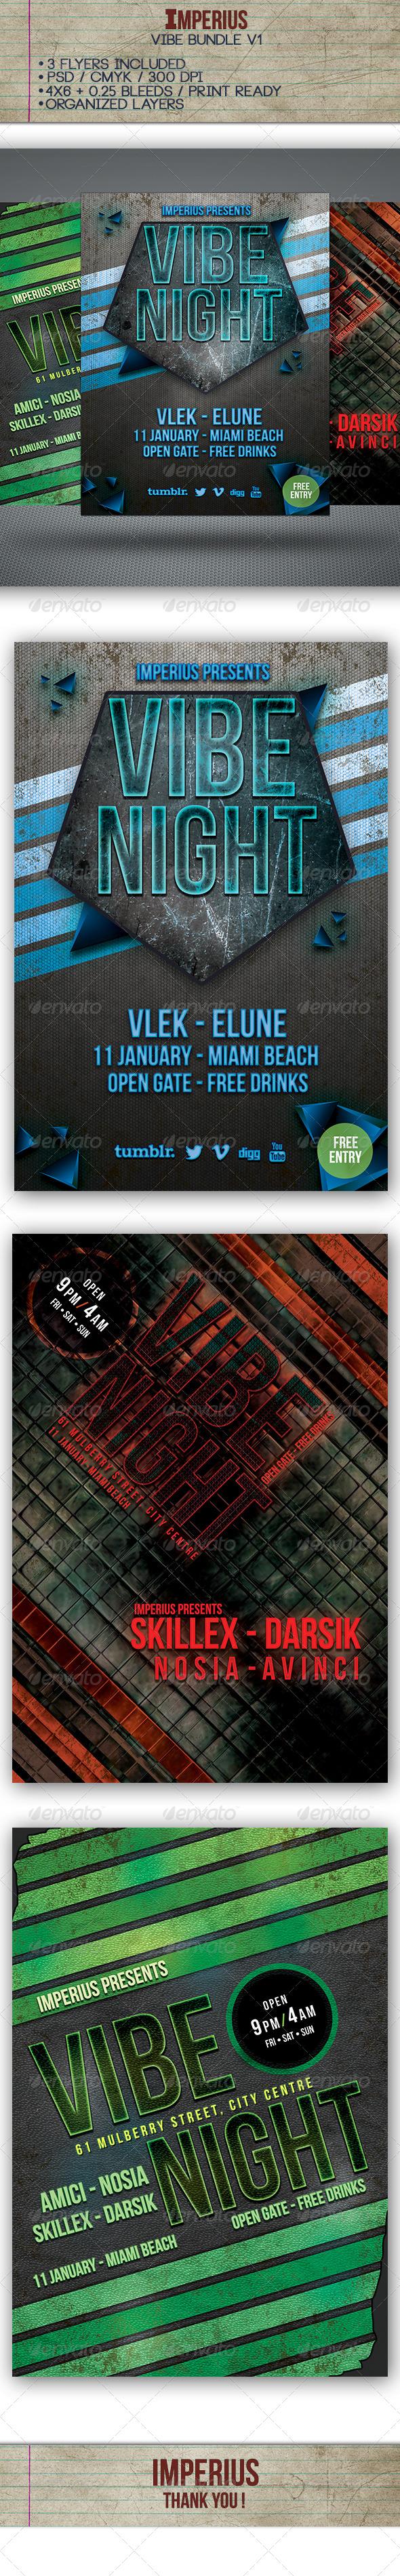 GraphicRiver Vibe Bundle Vol.1 7350921